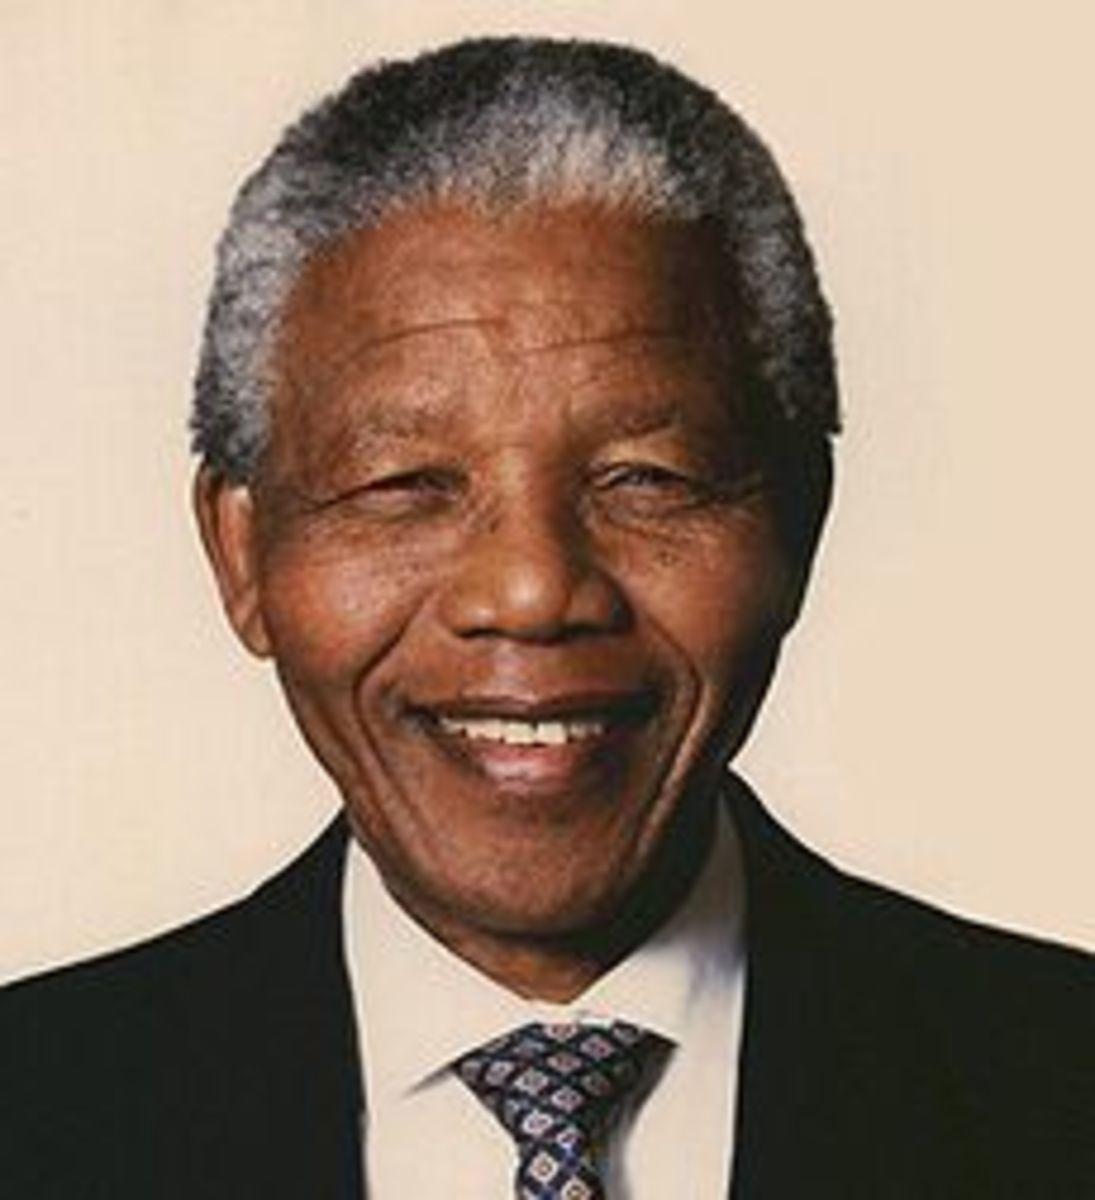 Nelson Mandella His Excellency